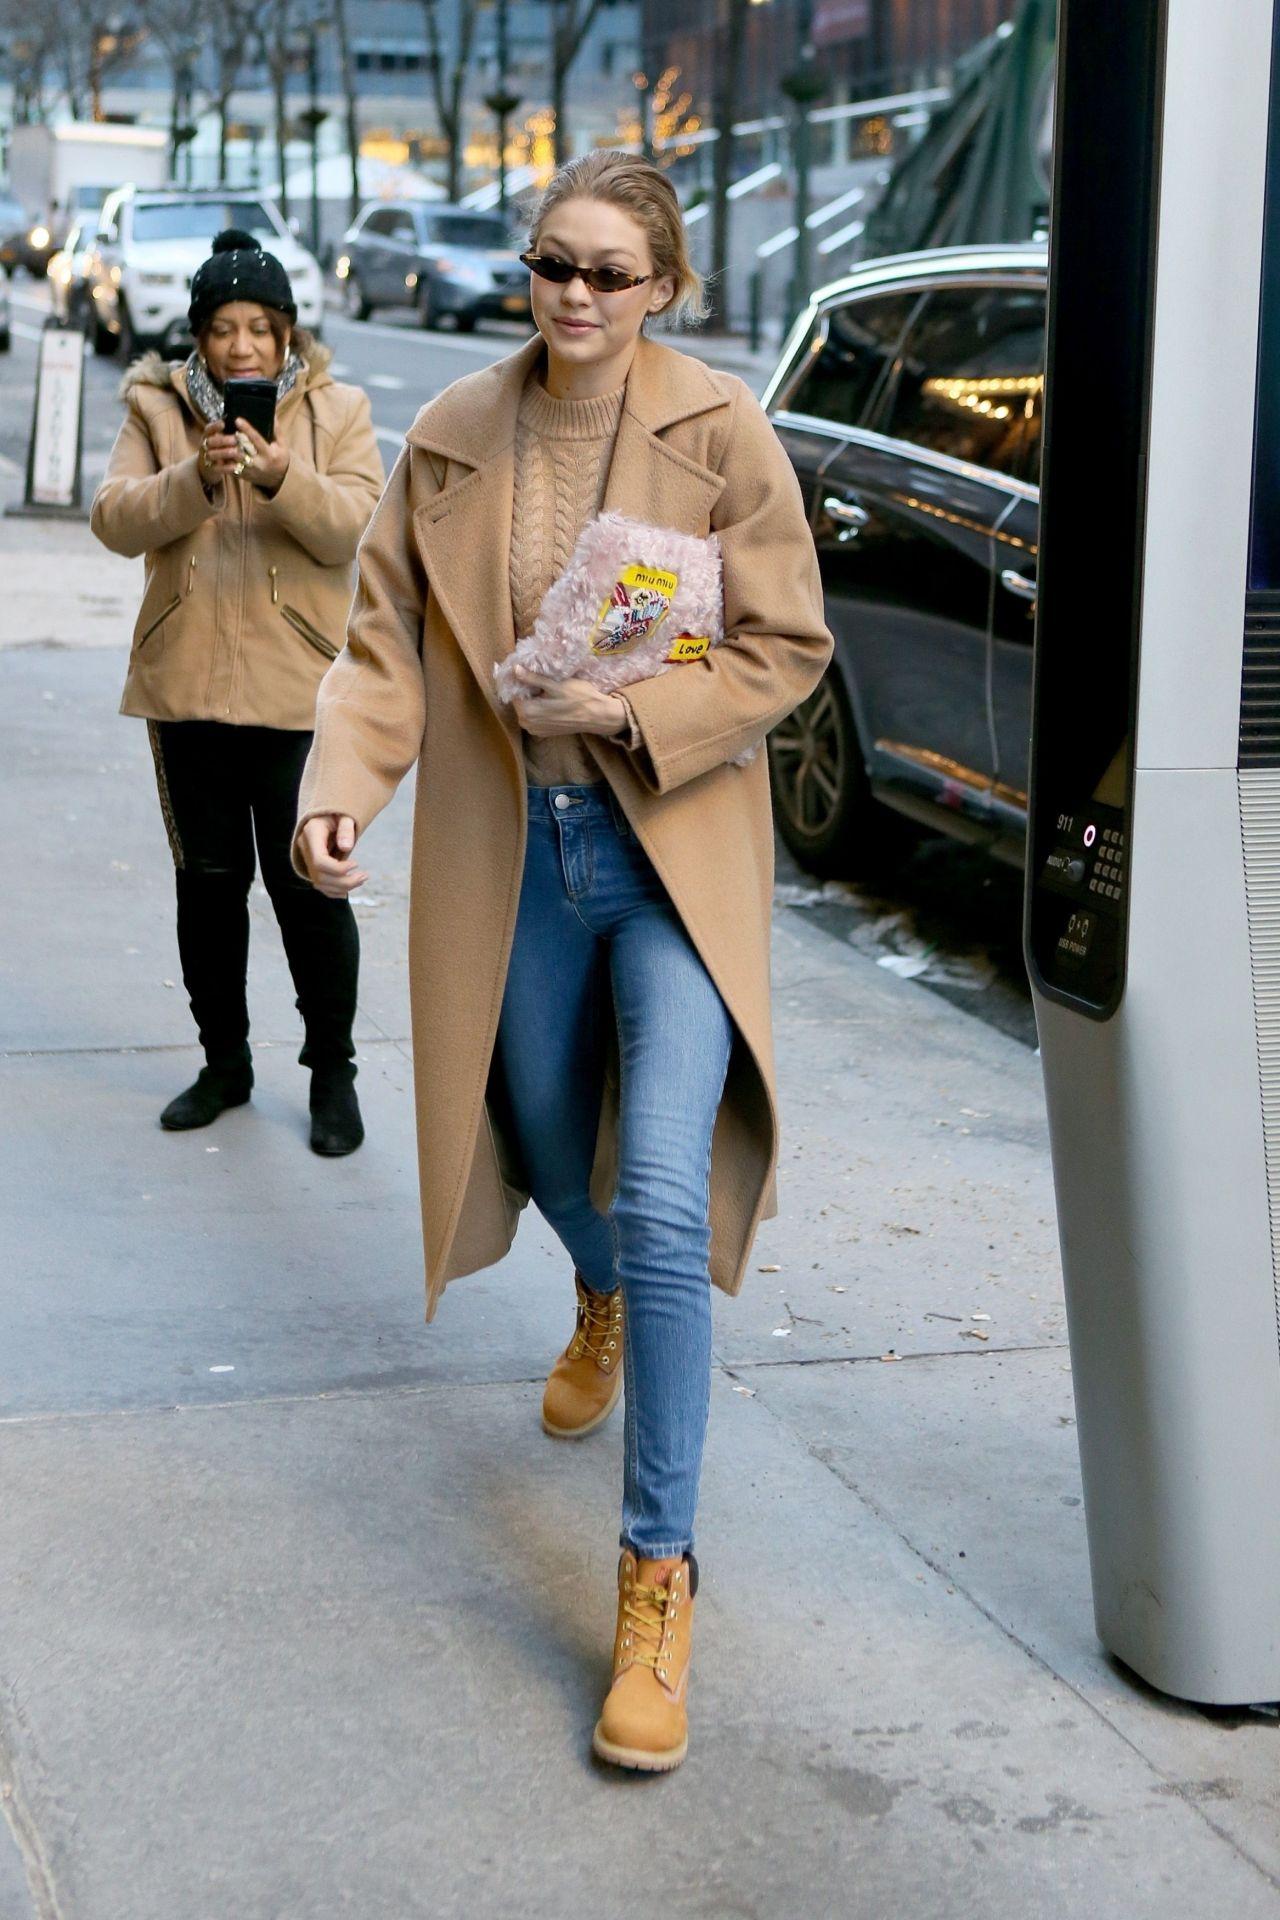 Gigi Hadid Winter Street Fashion New York 01 13 2018